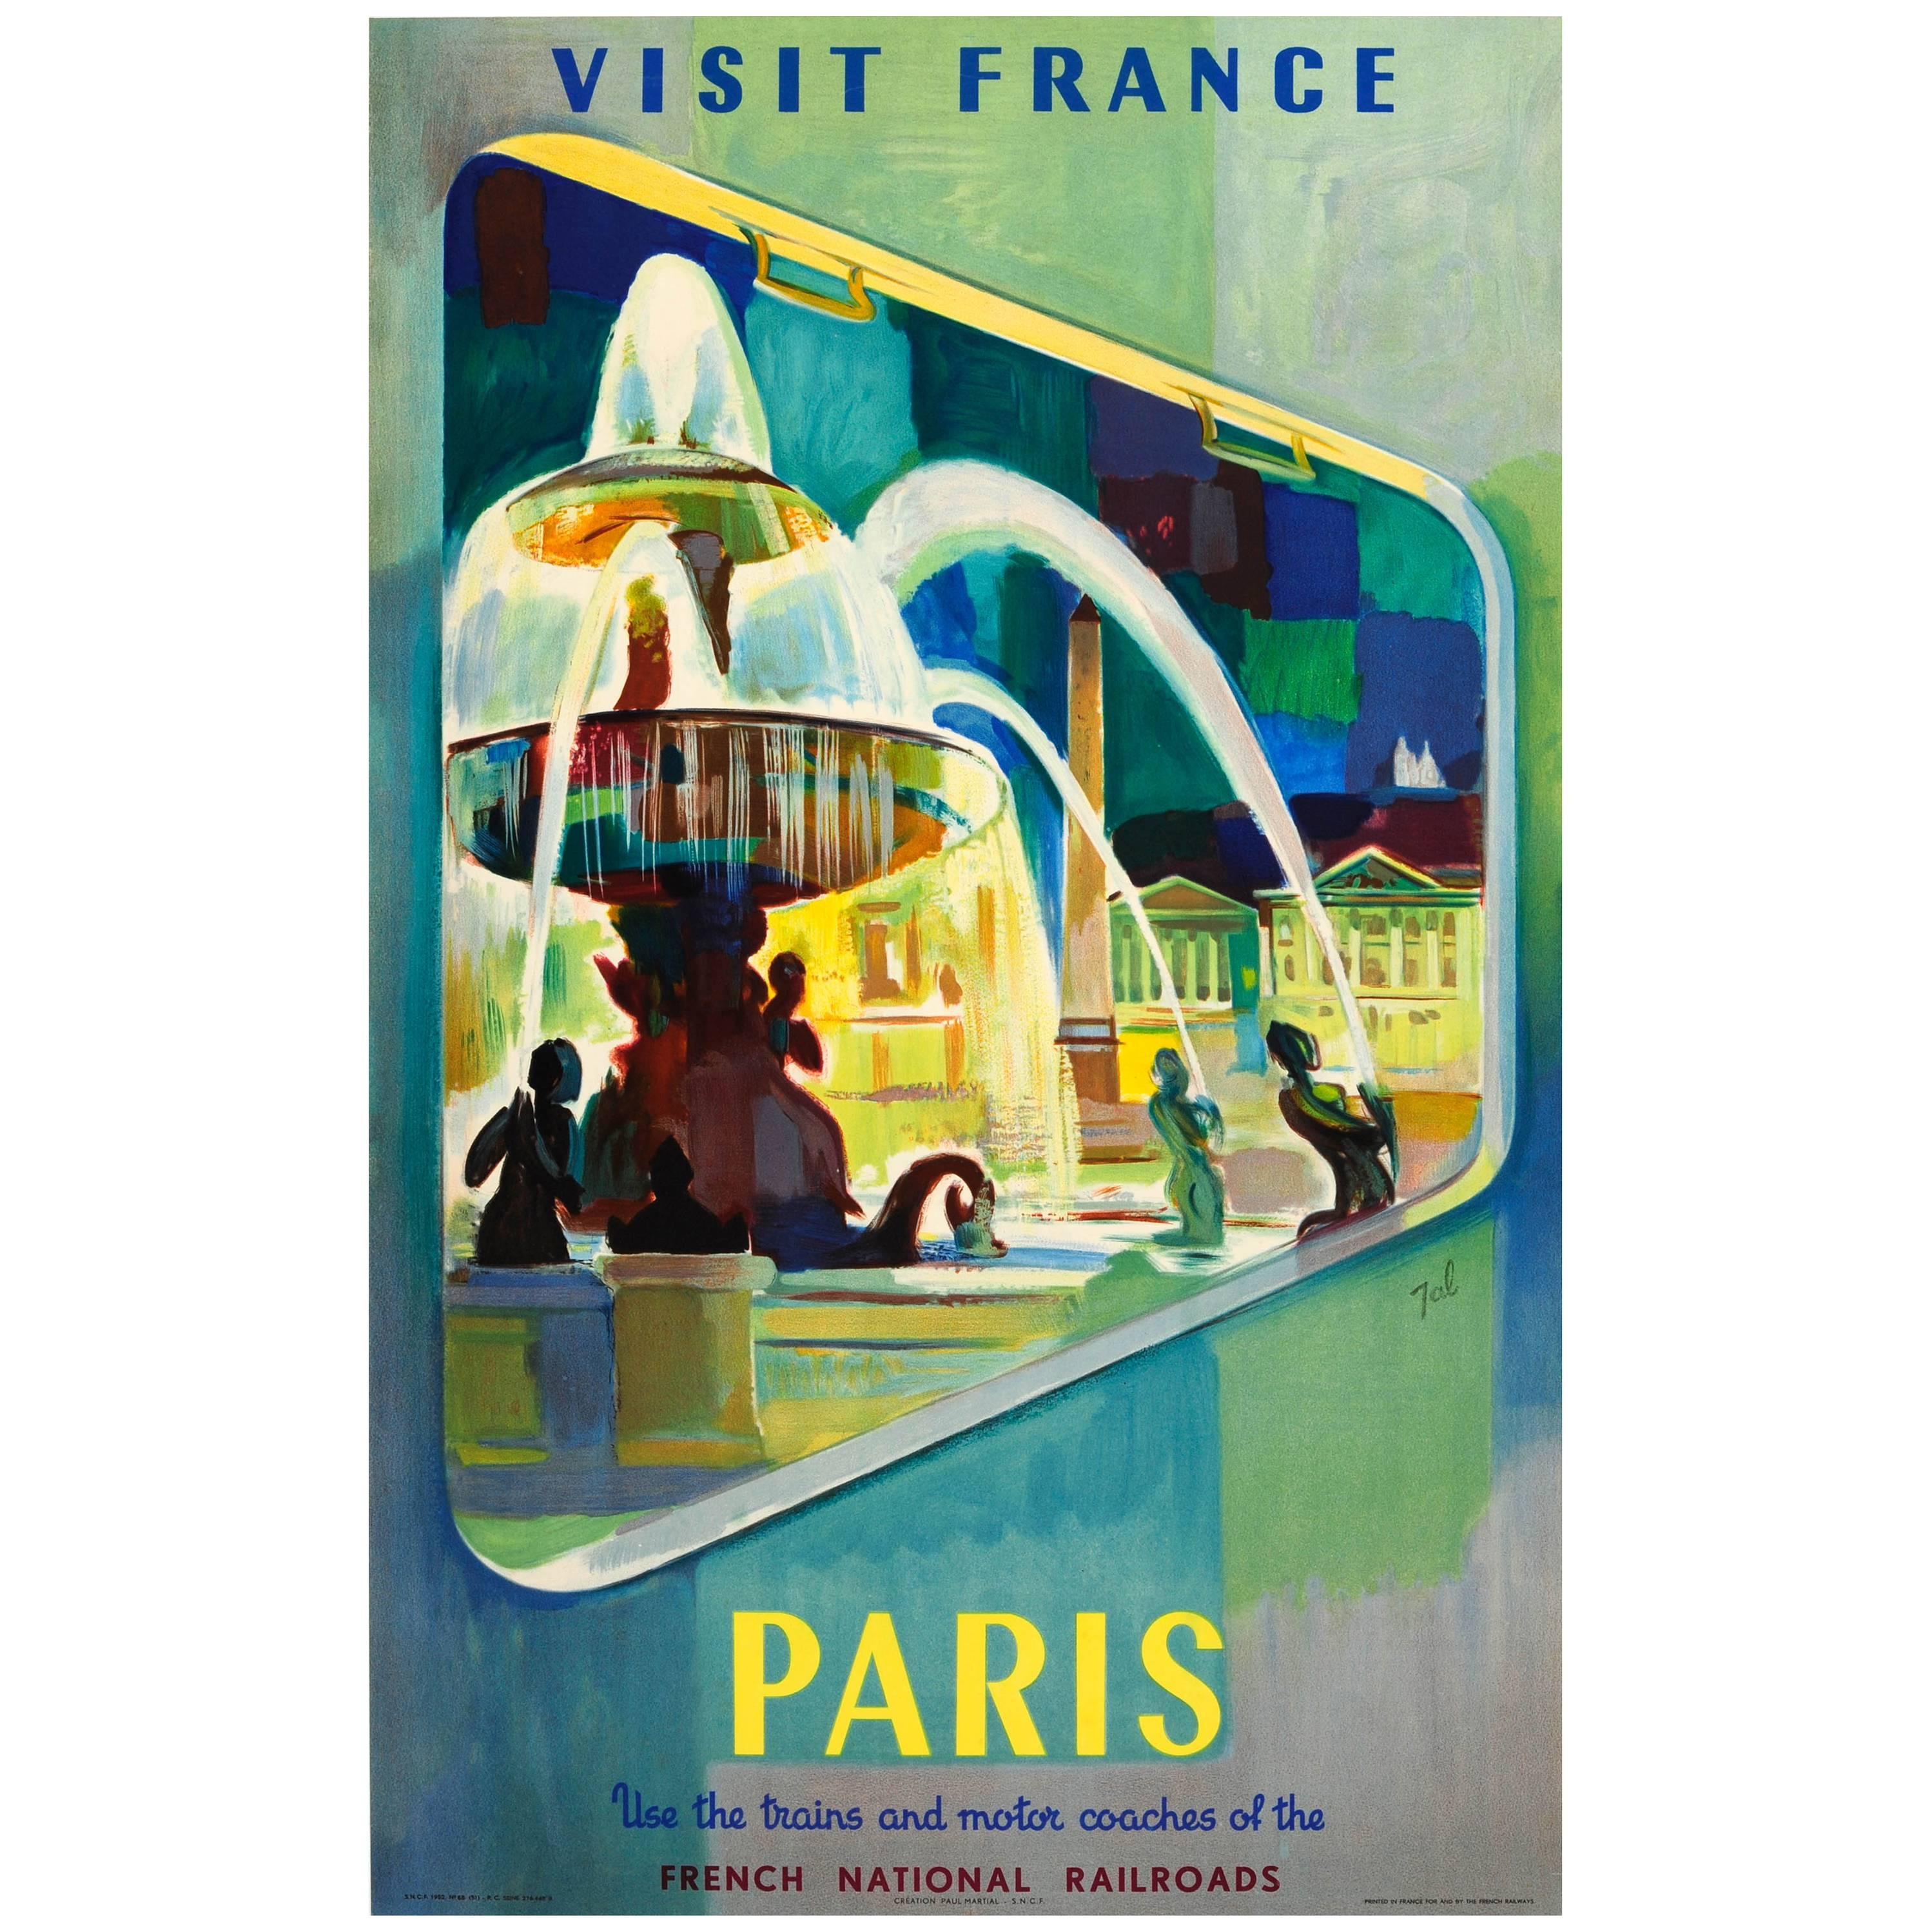 Original Vintage SNCF French National Railroads Travel Poster Visit France Paris